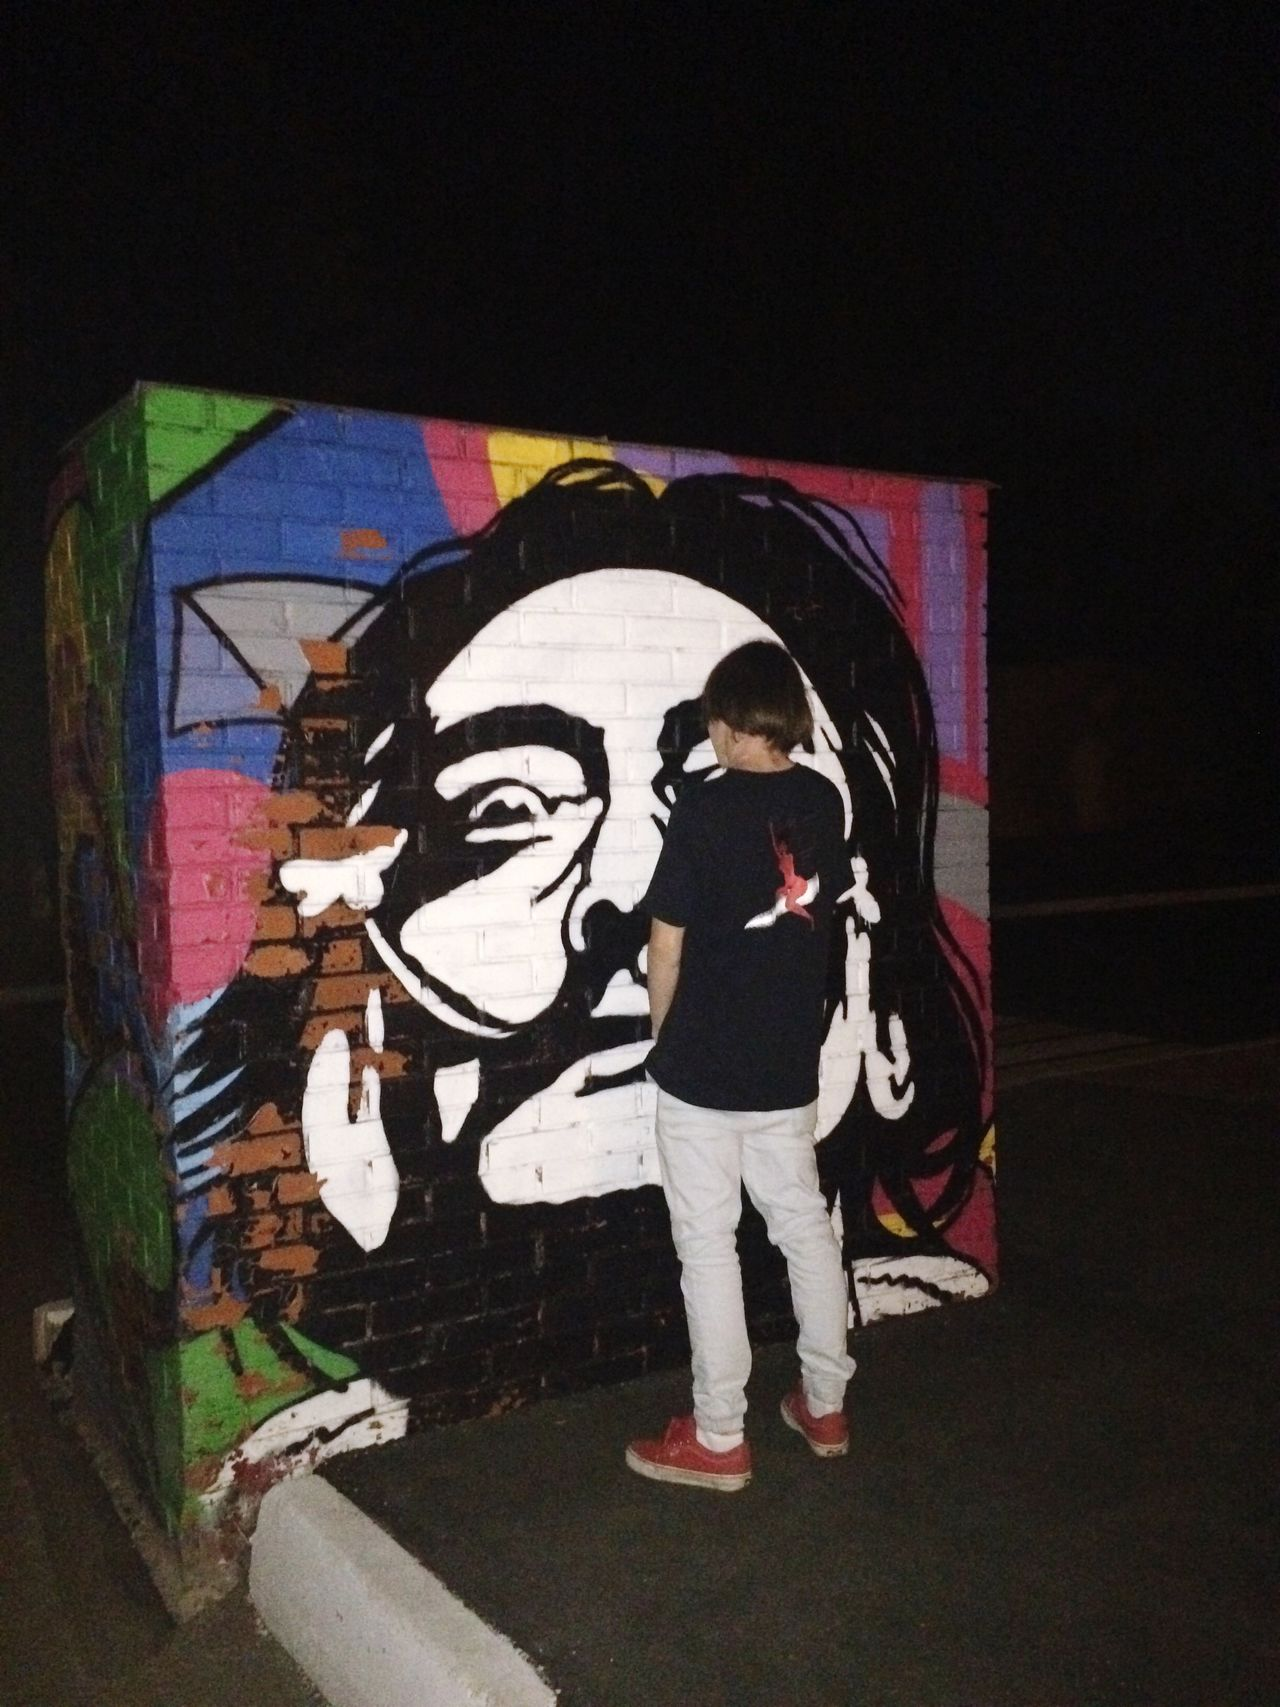 Graffiti Lifestyles Art Full Length Night Creativity Salvador Salvador Dali Salvadordali Wall First Eyeem Photo